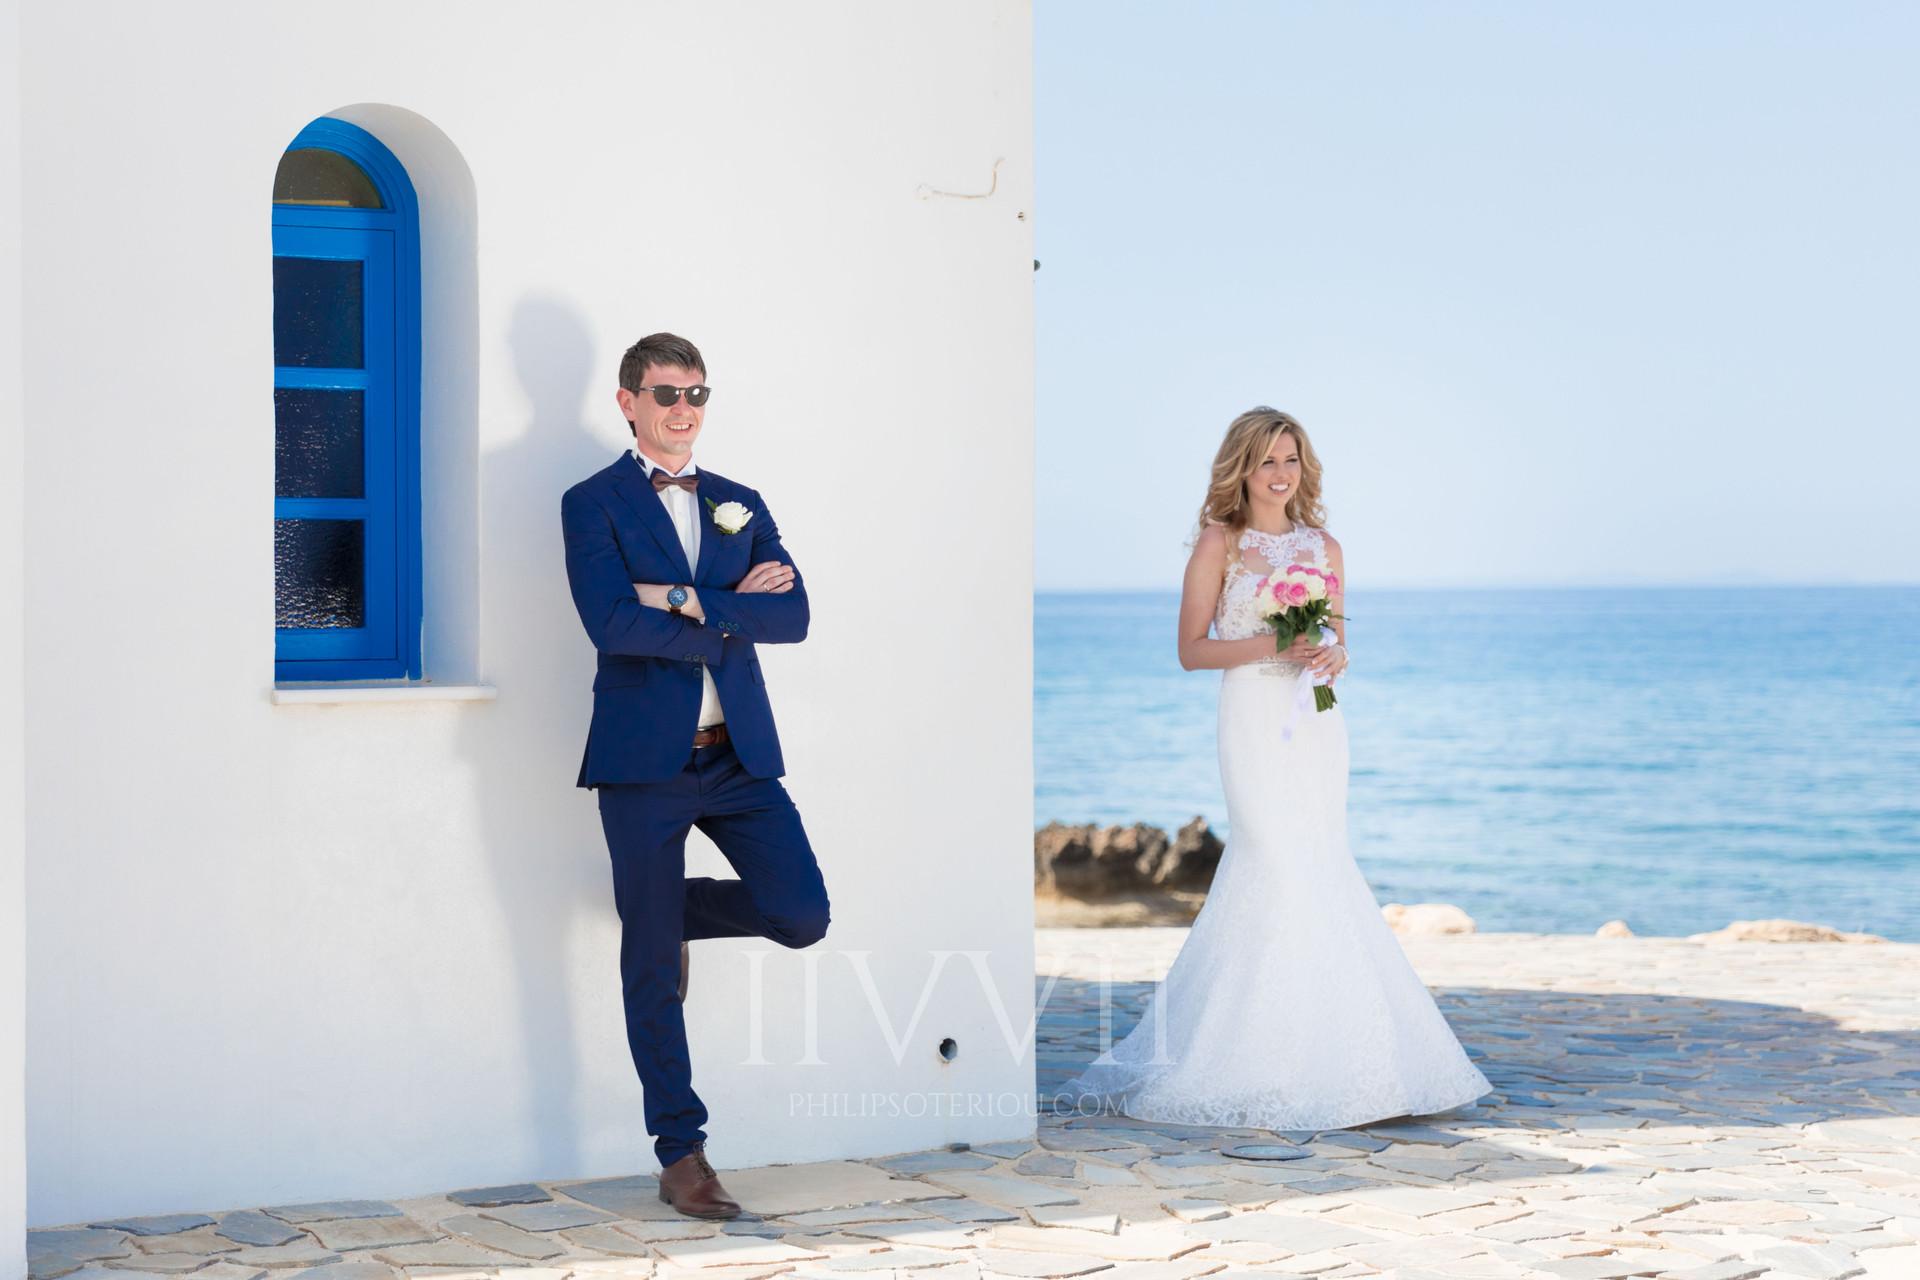 Gintare and Albertui Wedding-38.jpg